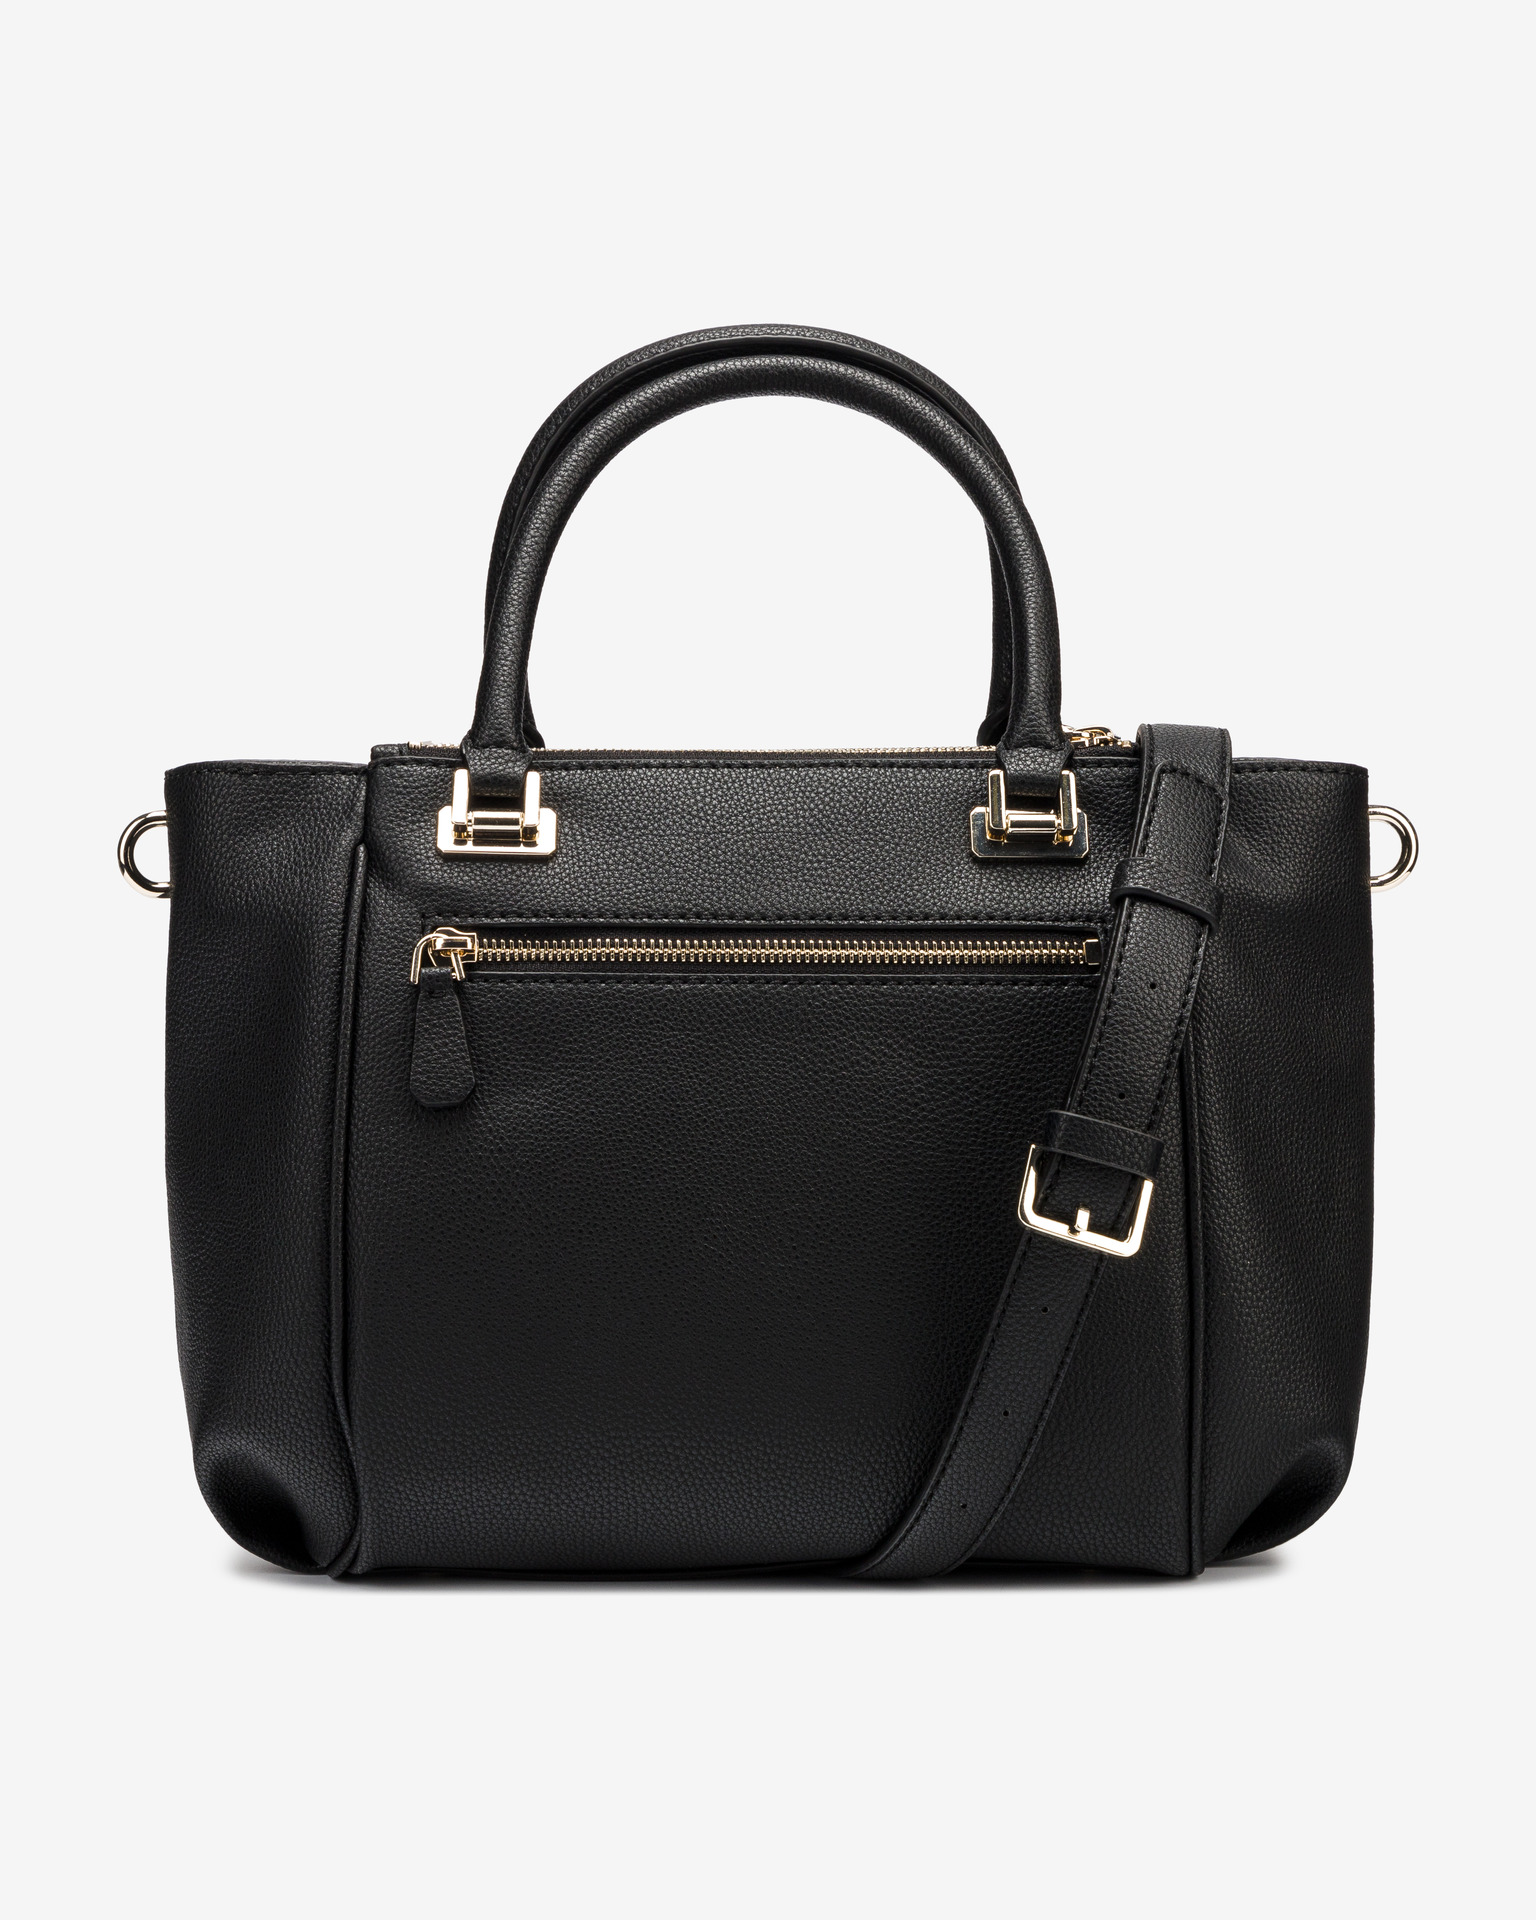 Guess black handbag Destiny Status